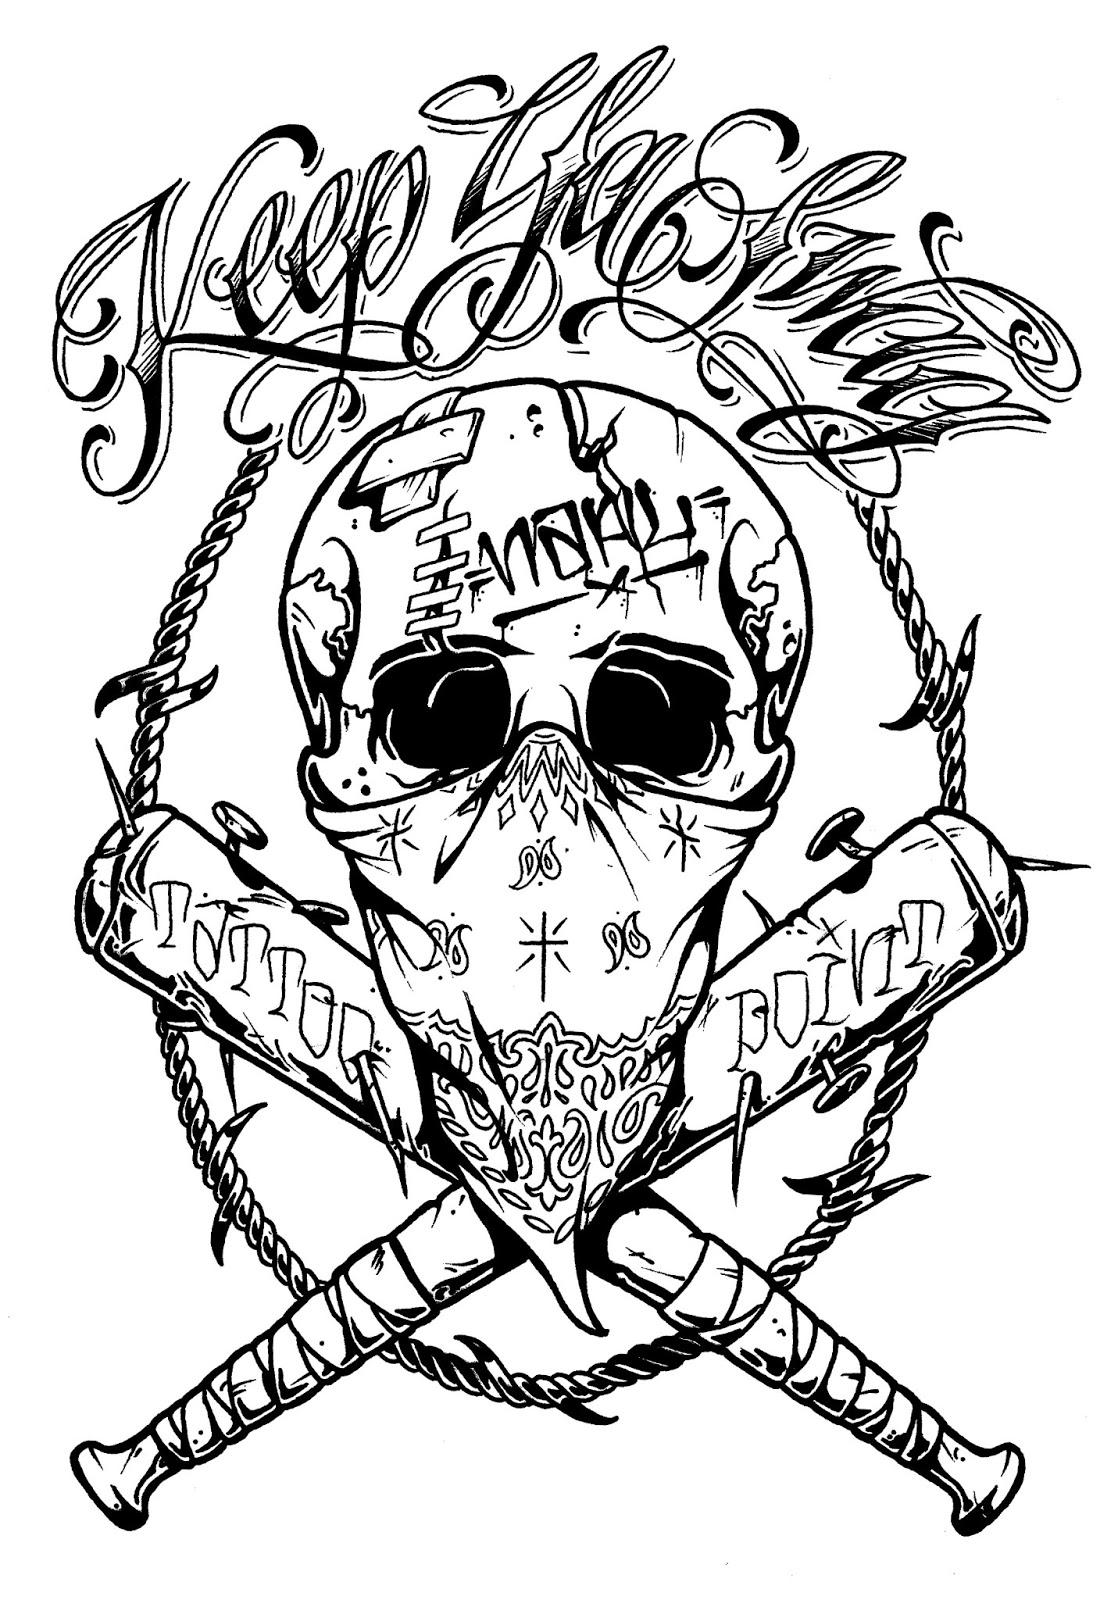 Sun Moon Cloud Sun Tattoos | Full Body Tattoos